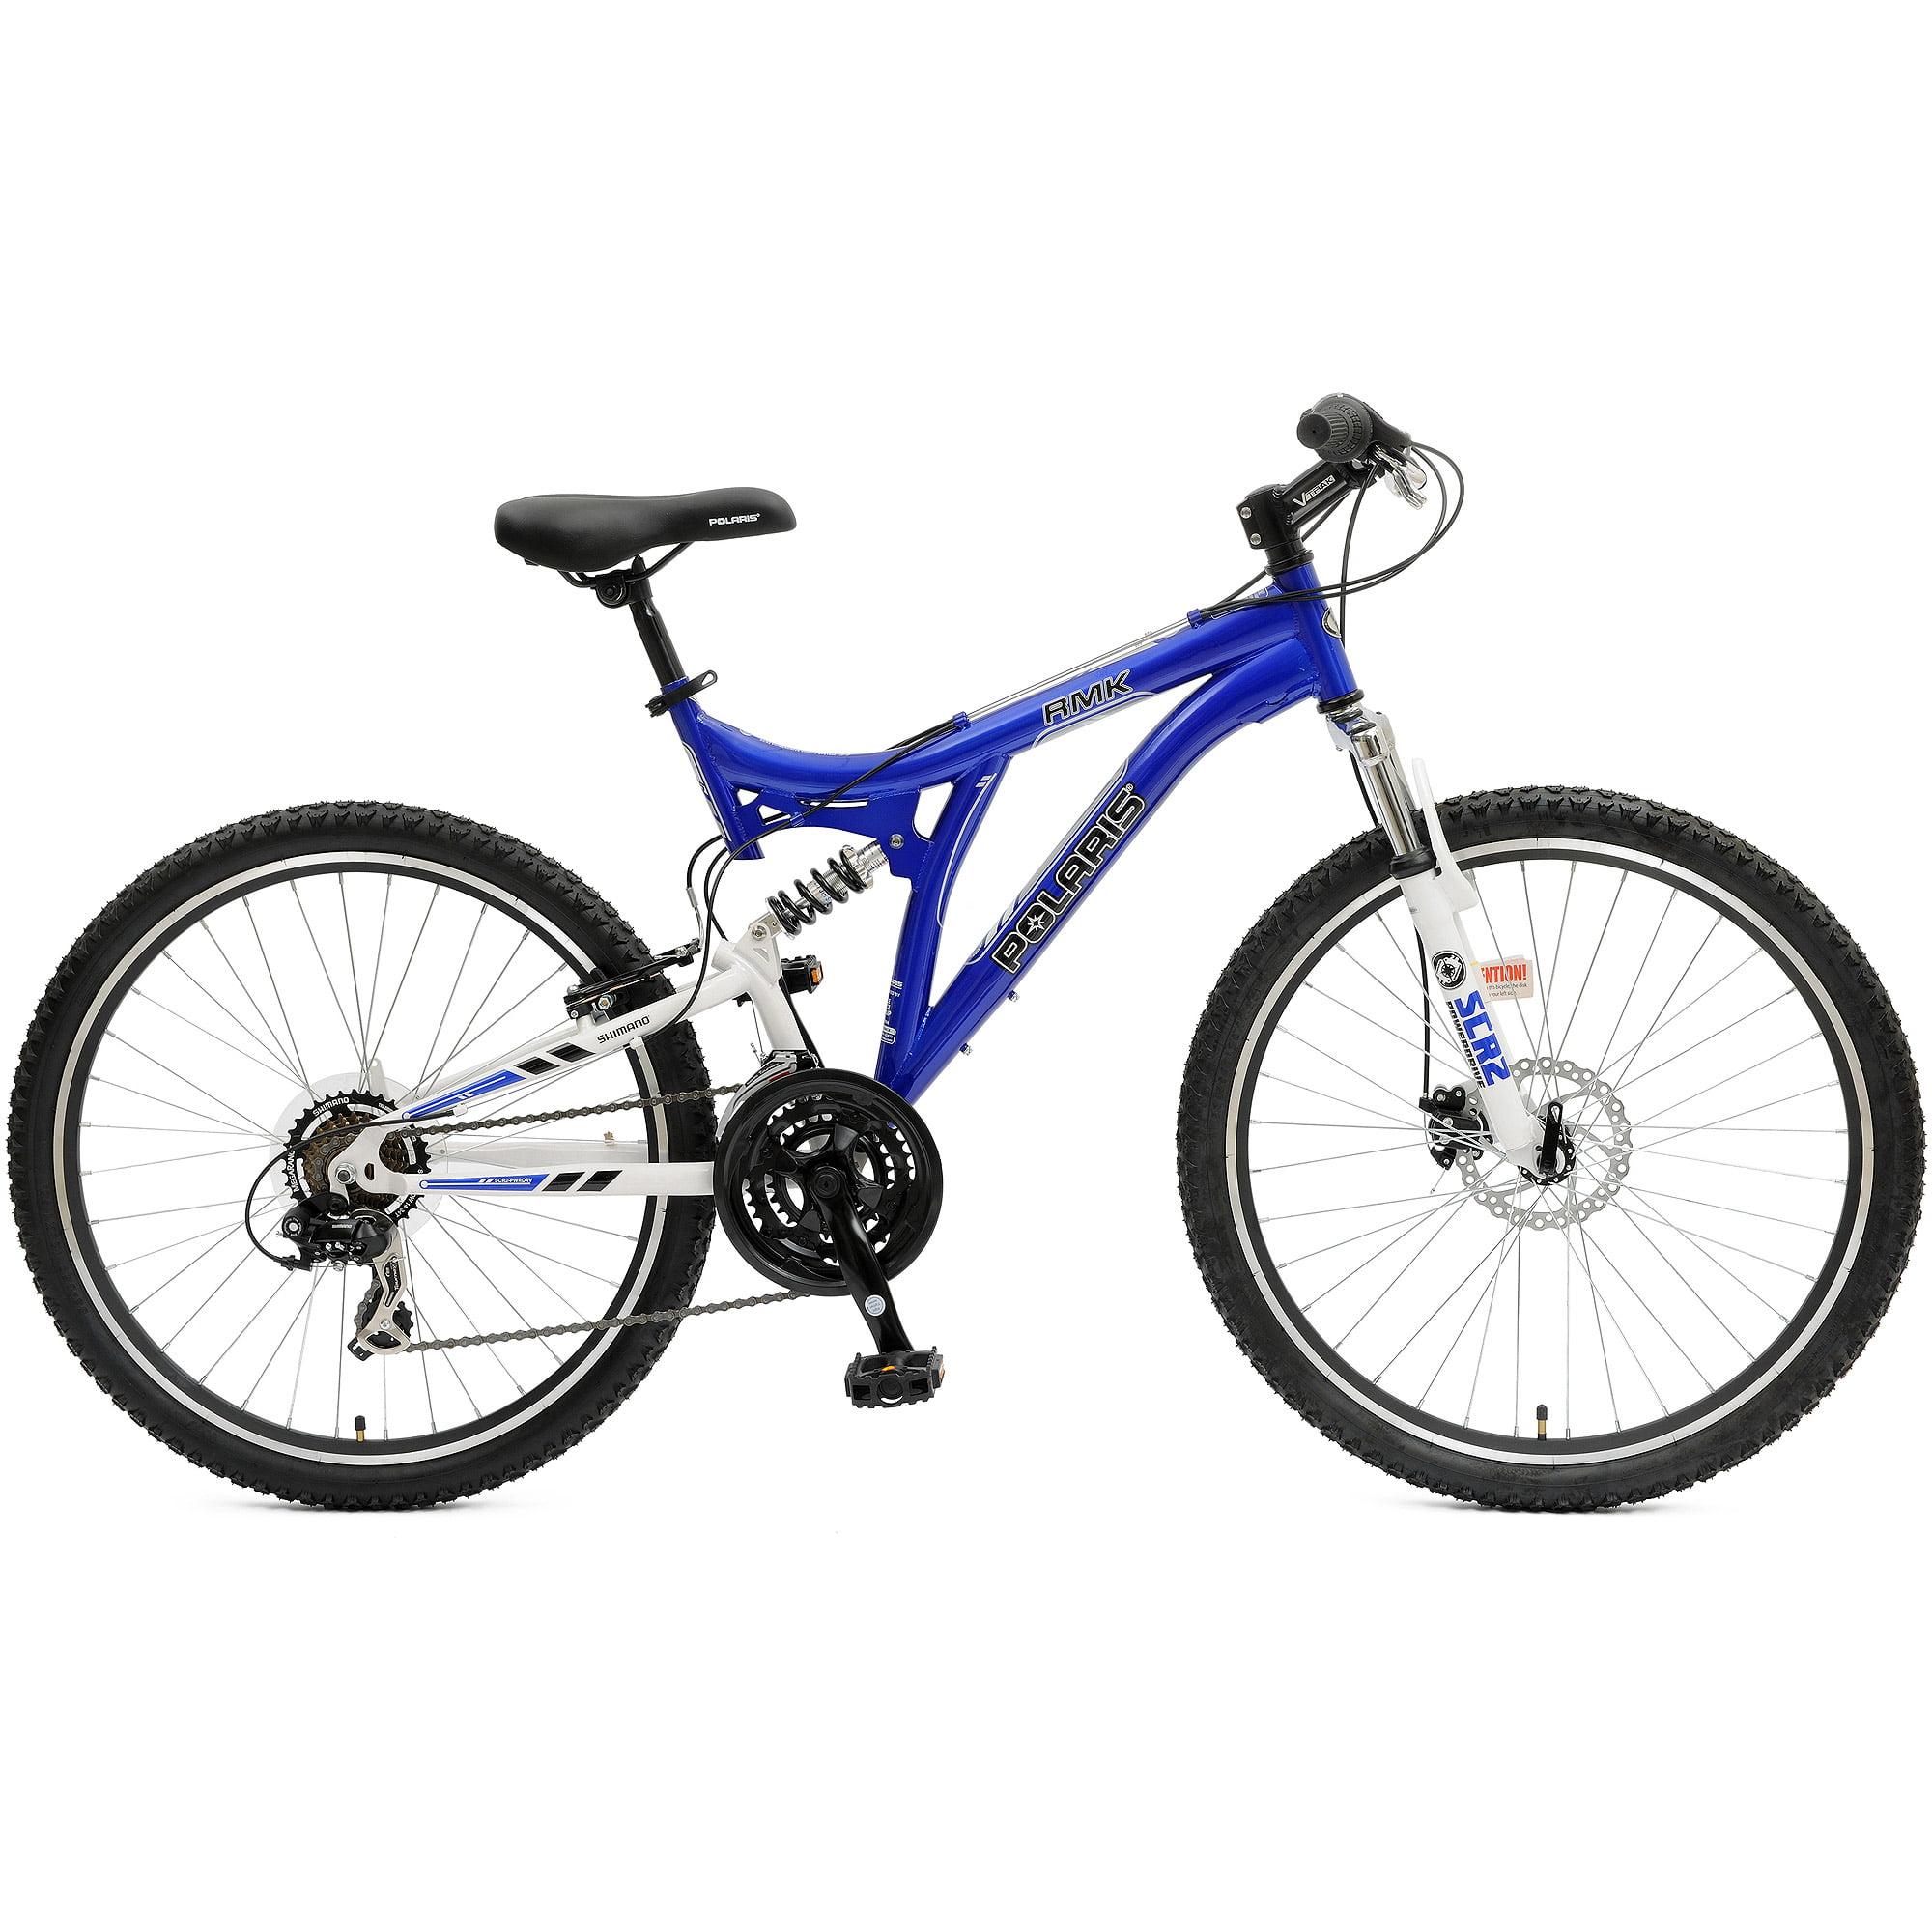 Dual Suspension Mountain Bikes Walmart >> Polaris Rmk Full Suspension Bicycle Walmart Com